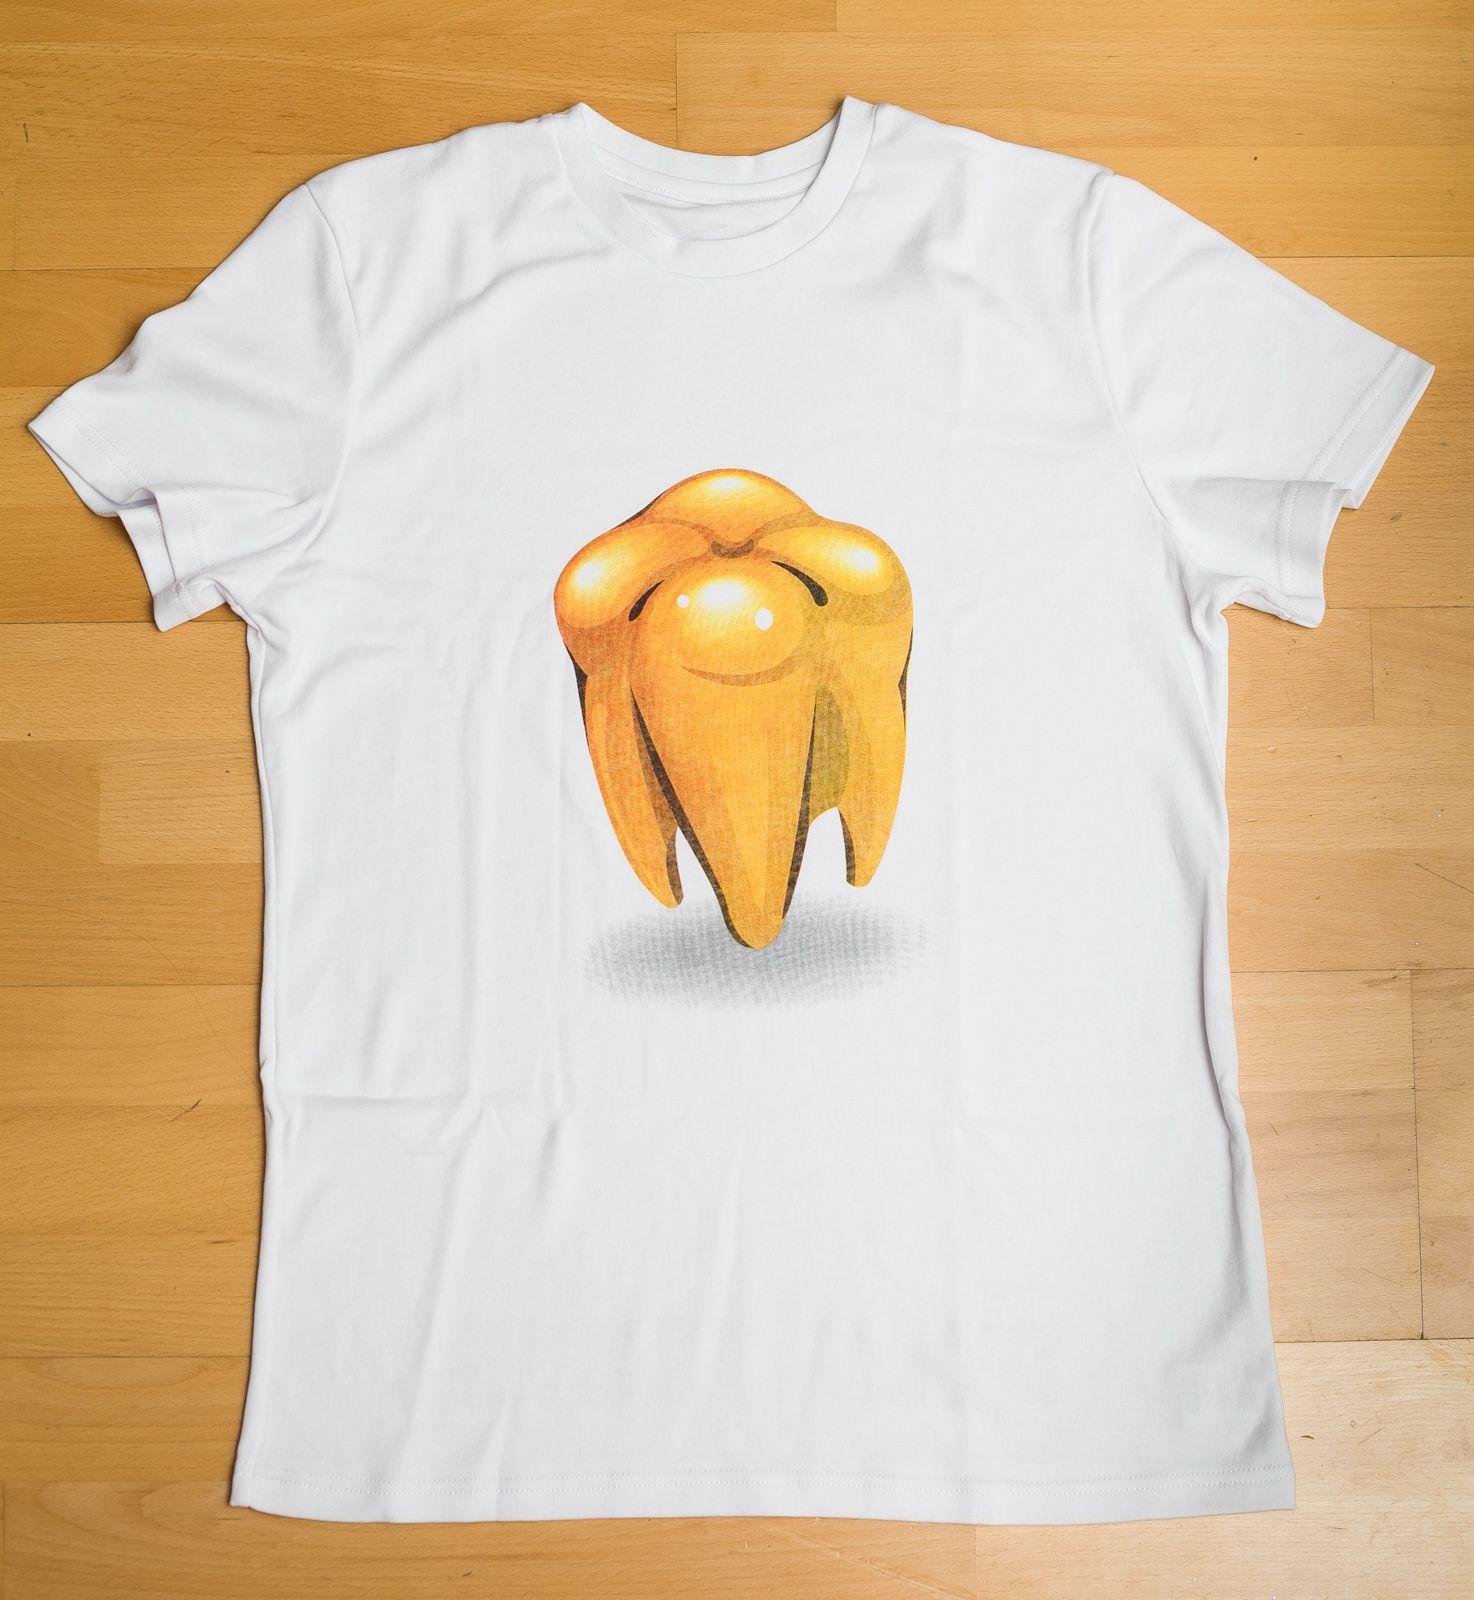 хлопок футболка одежда бренд питер уличнаяодежда goldtoothco